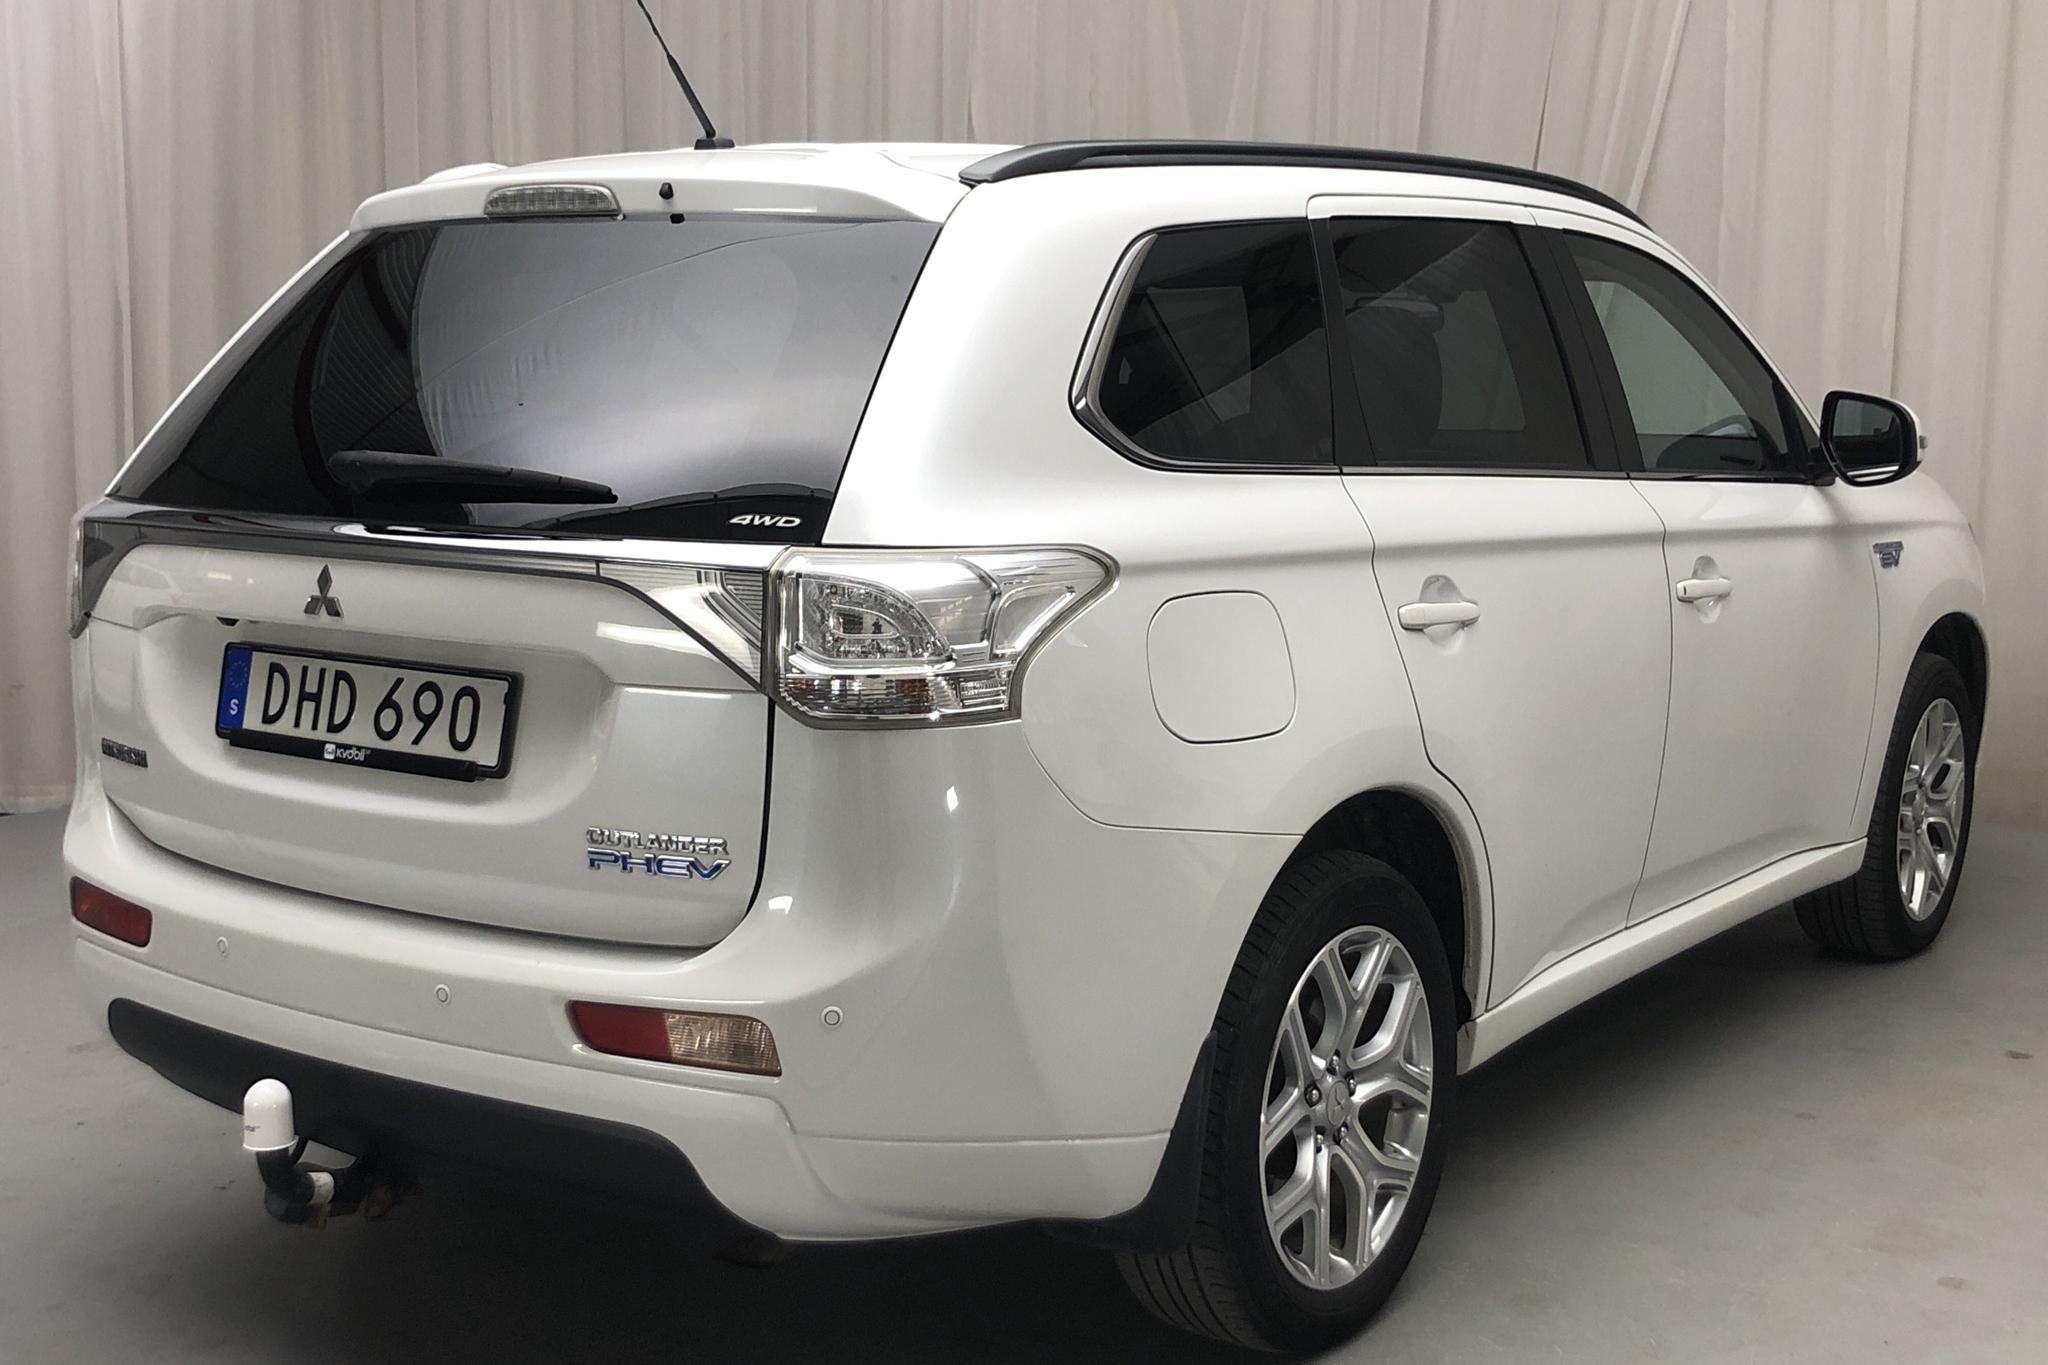 Mitsubishi Outlander 2.0 Plug-in Hybrid 4WD (121hk) - 180 480 km - Automatic - white - 2014